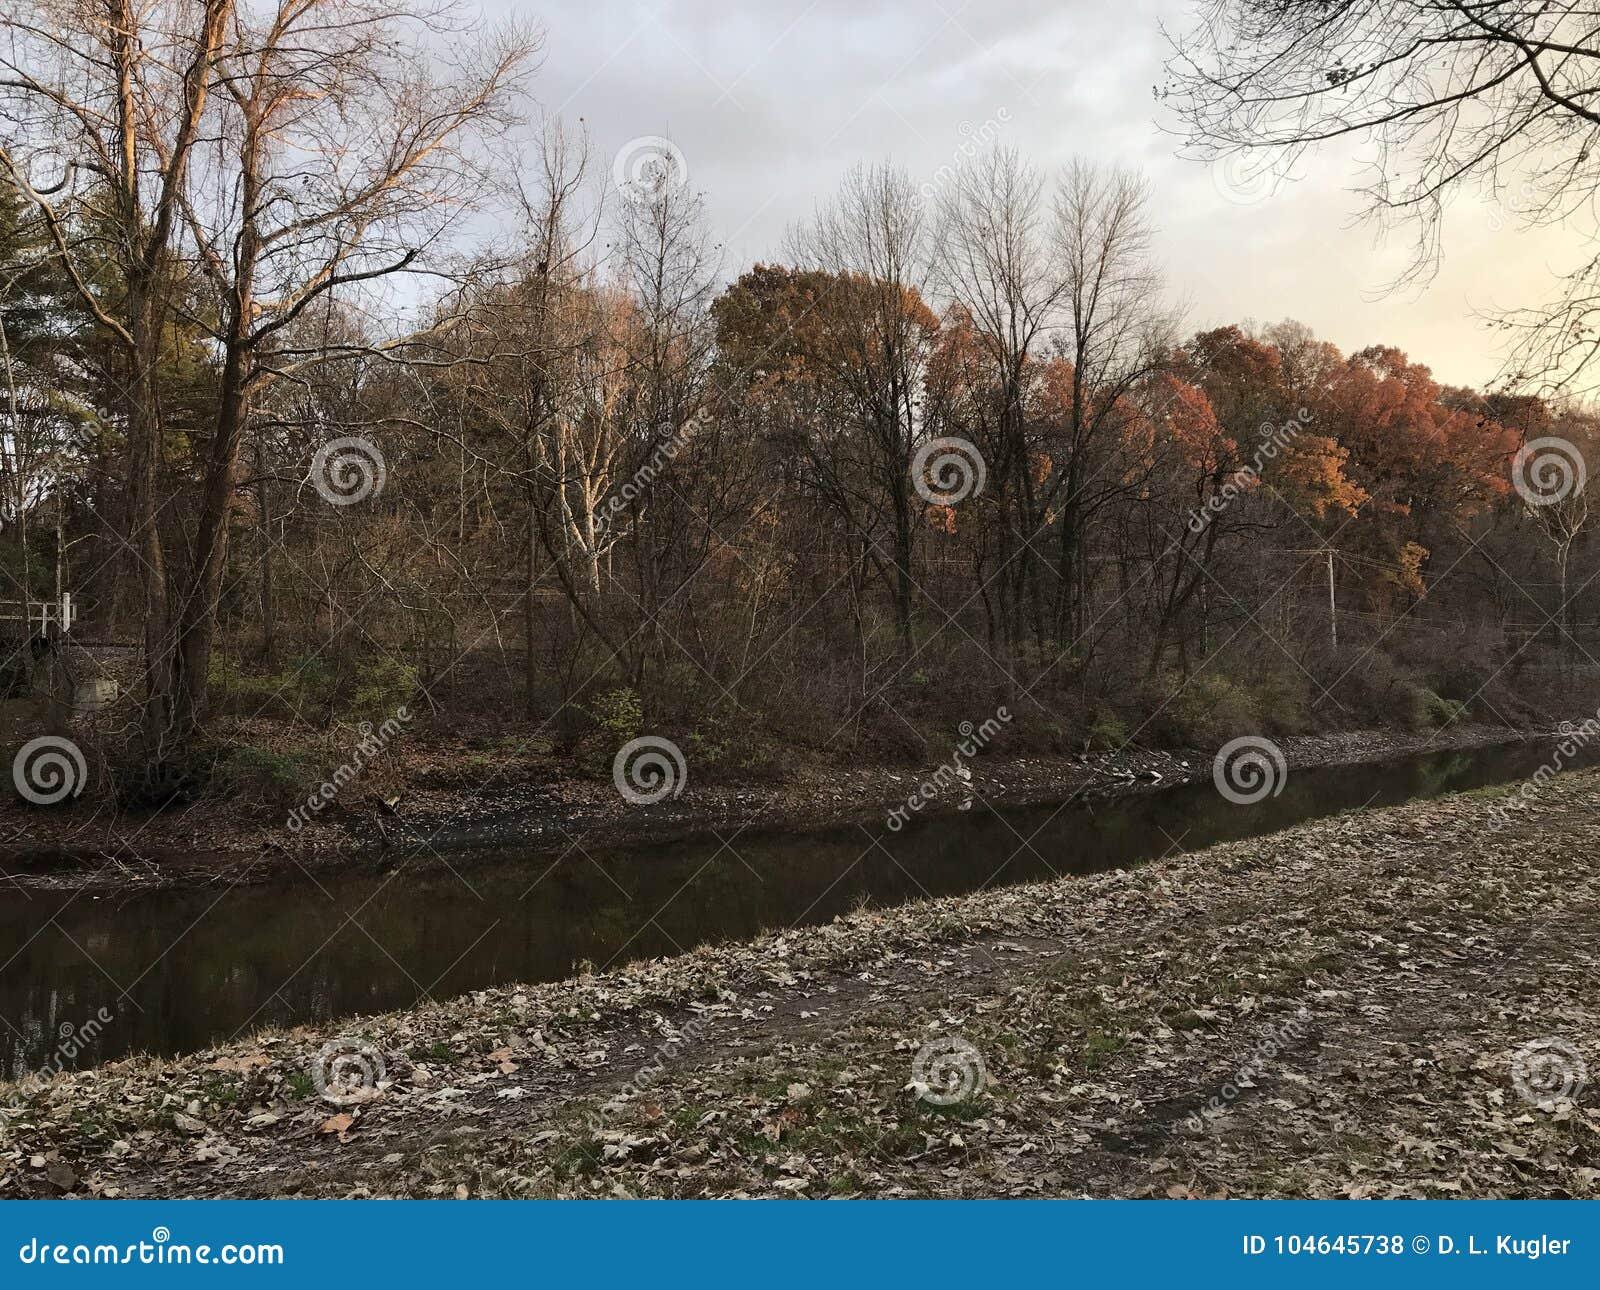 Lehigh Canal And Tow Oath, Easton Pennsylvania USA Stock Photo